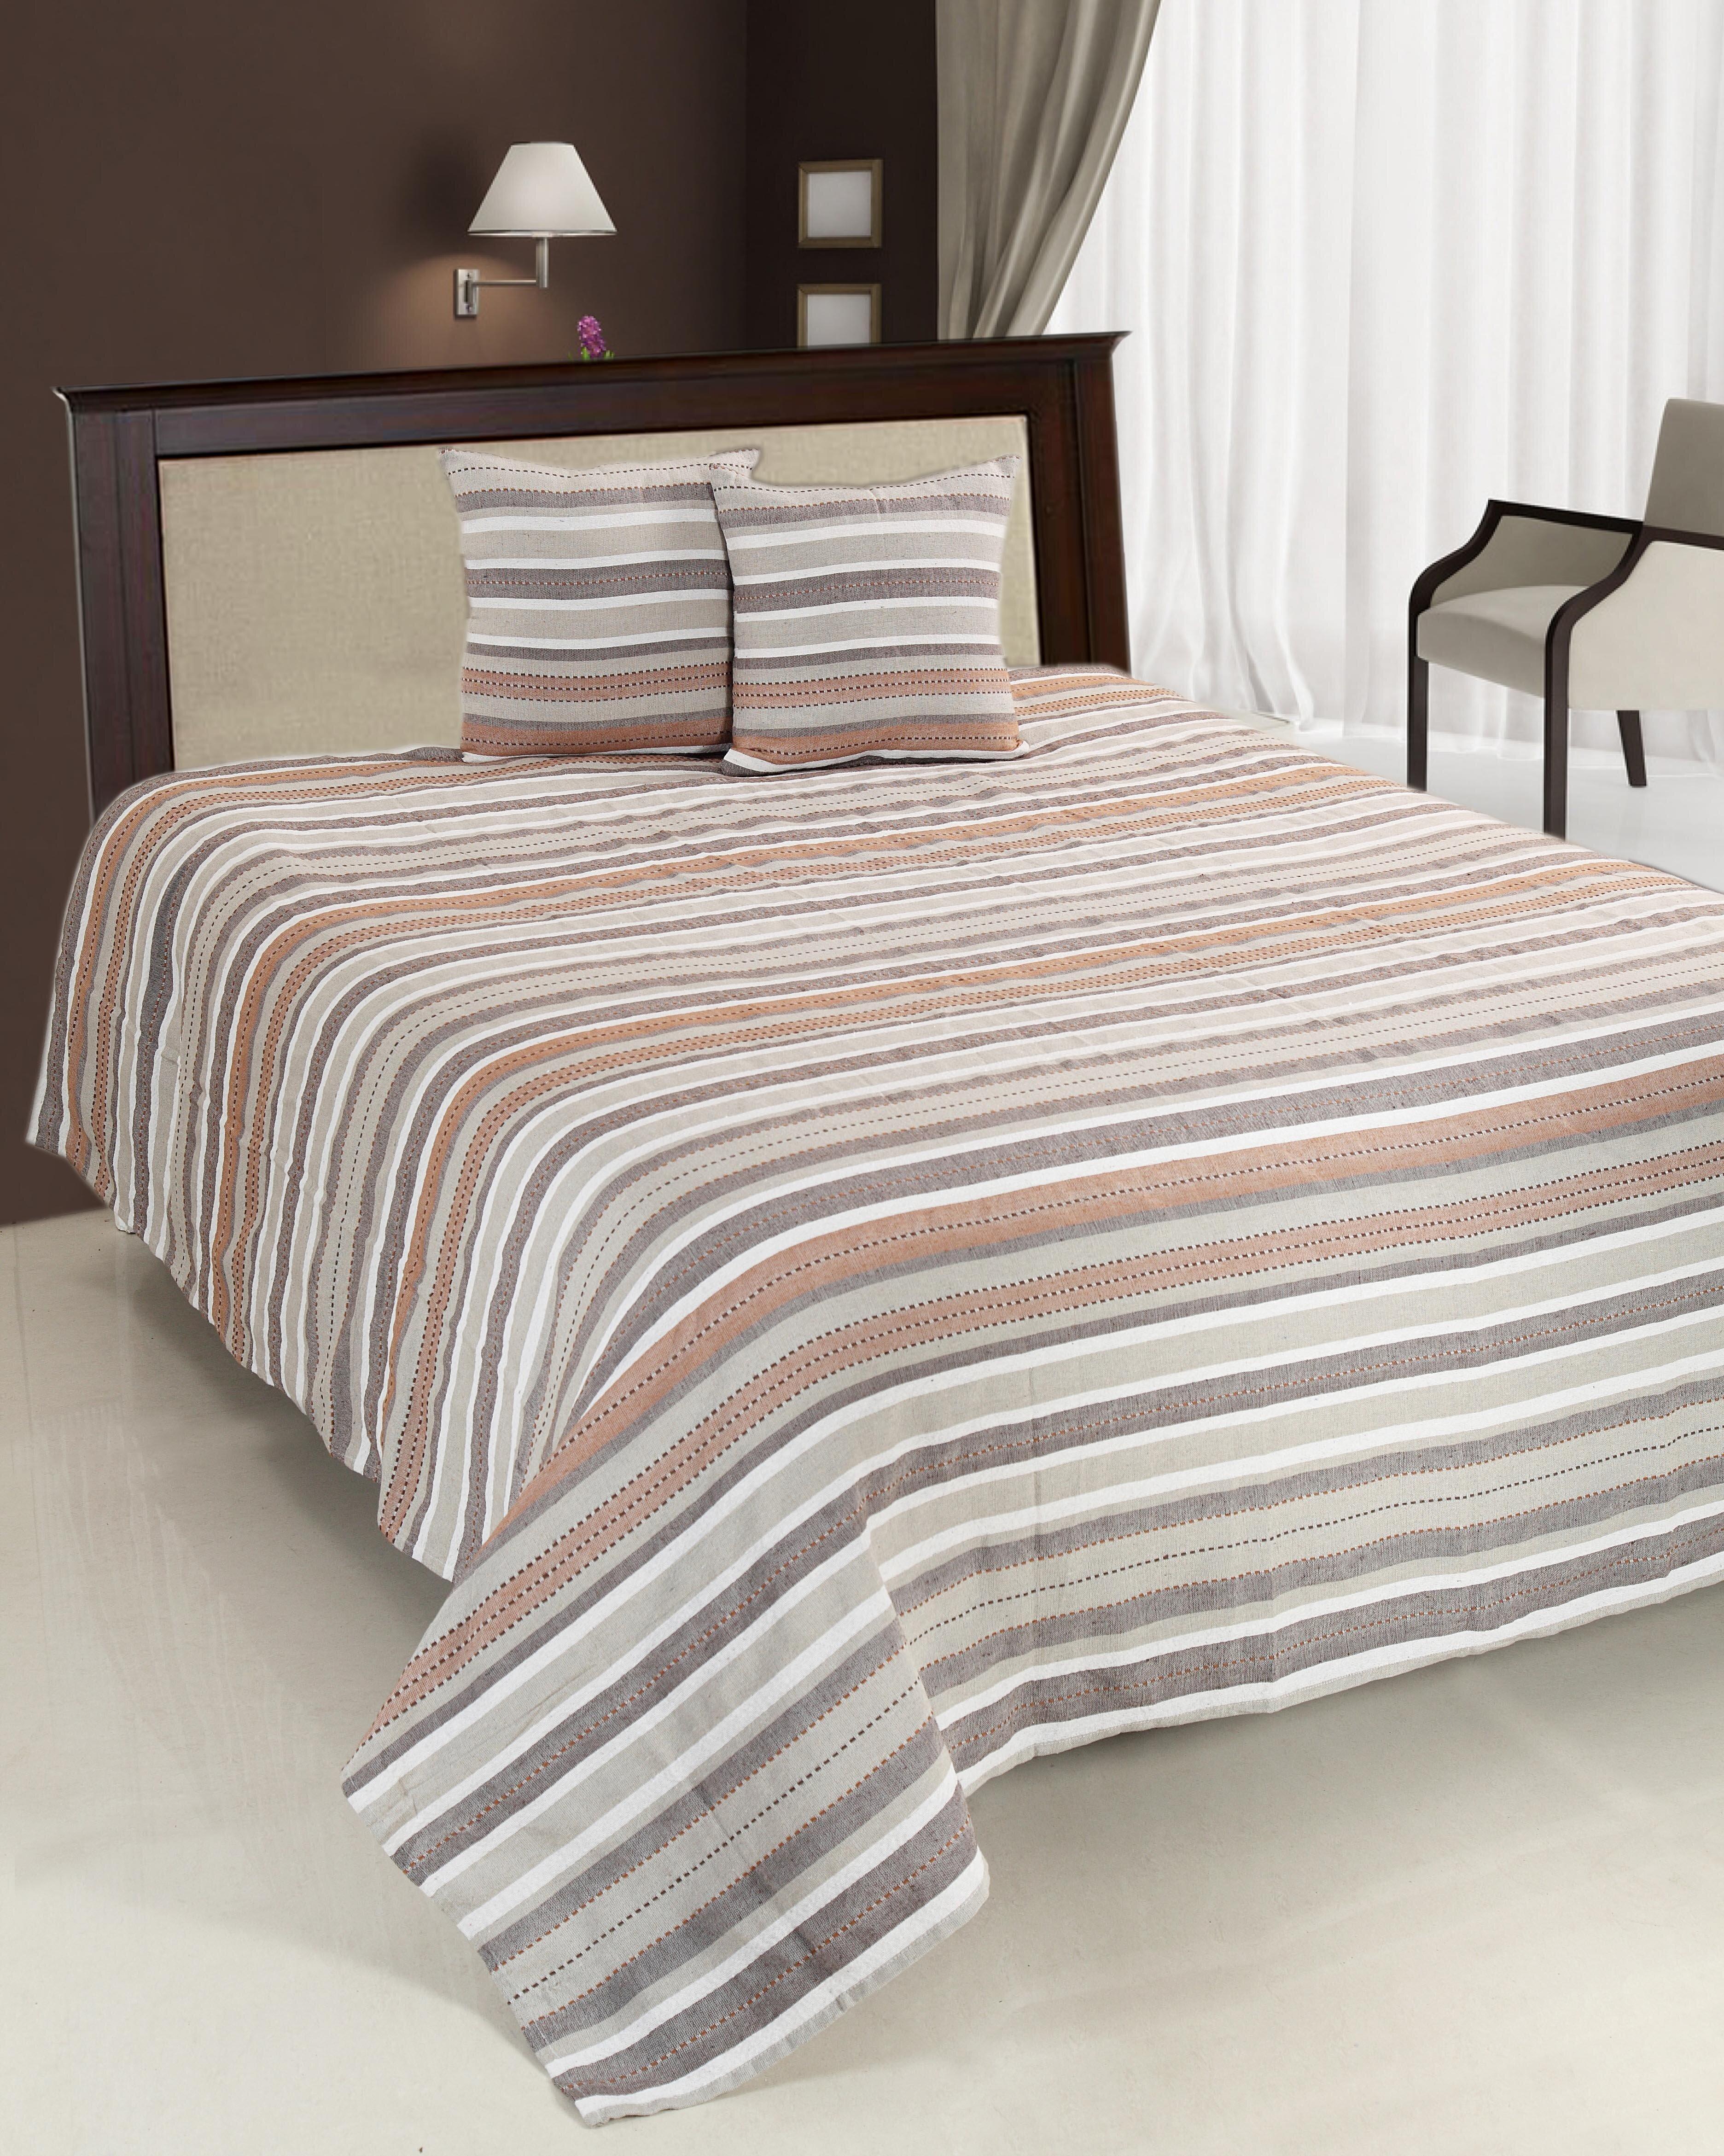 Set cuvertura de pat dublu, Heinner, HR-CUV-220BRW, 200x220